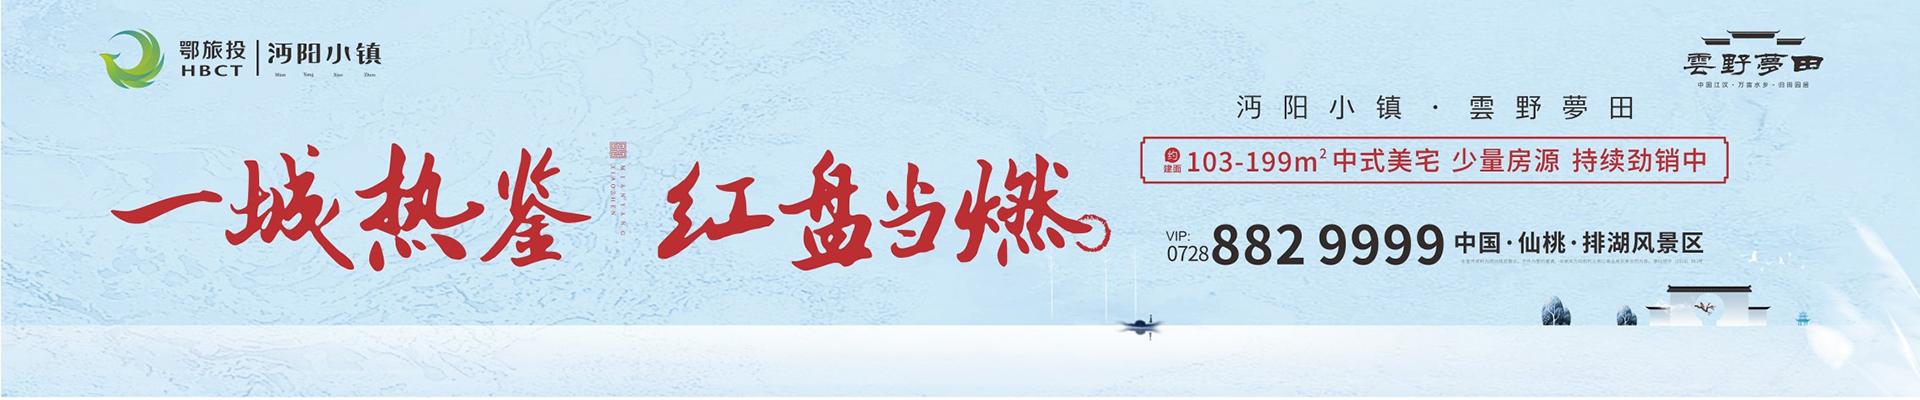 沔陽小(xiao)鎮(zhen)